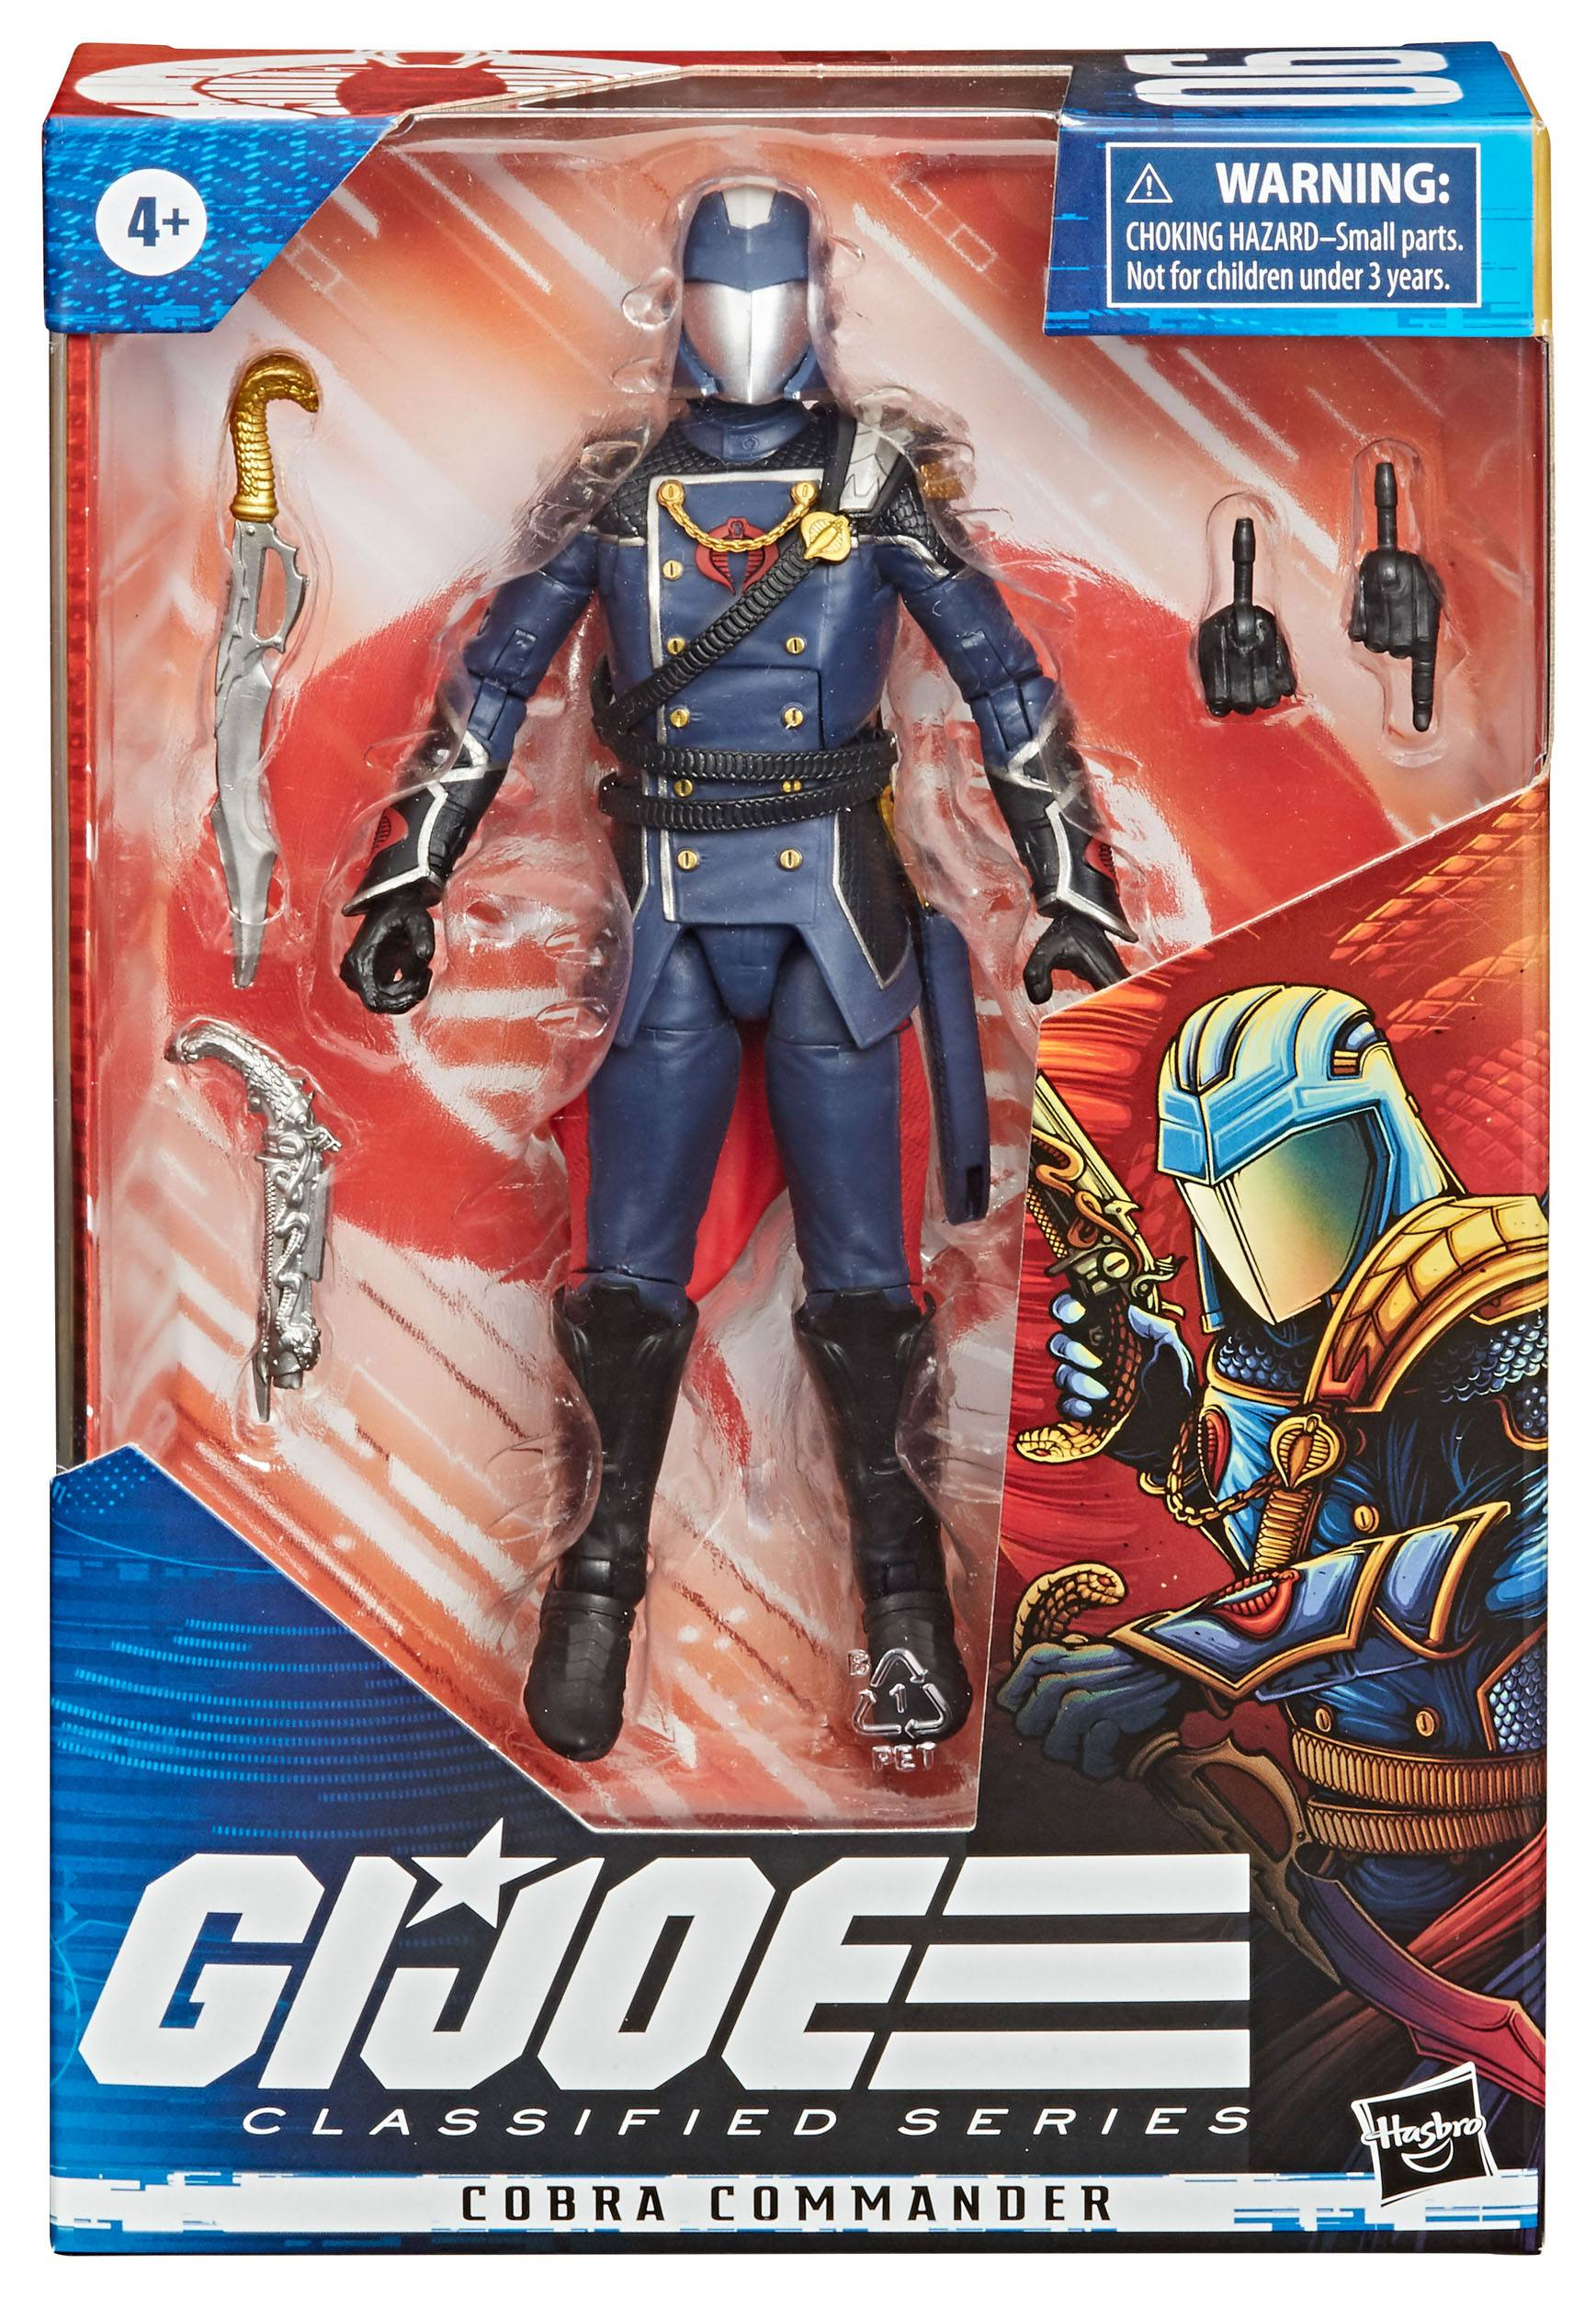 G.I. Joe Classified Series FIGURE COBRA COMMANDER 15cm